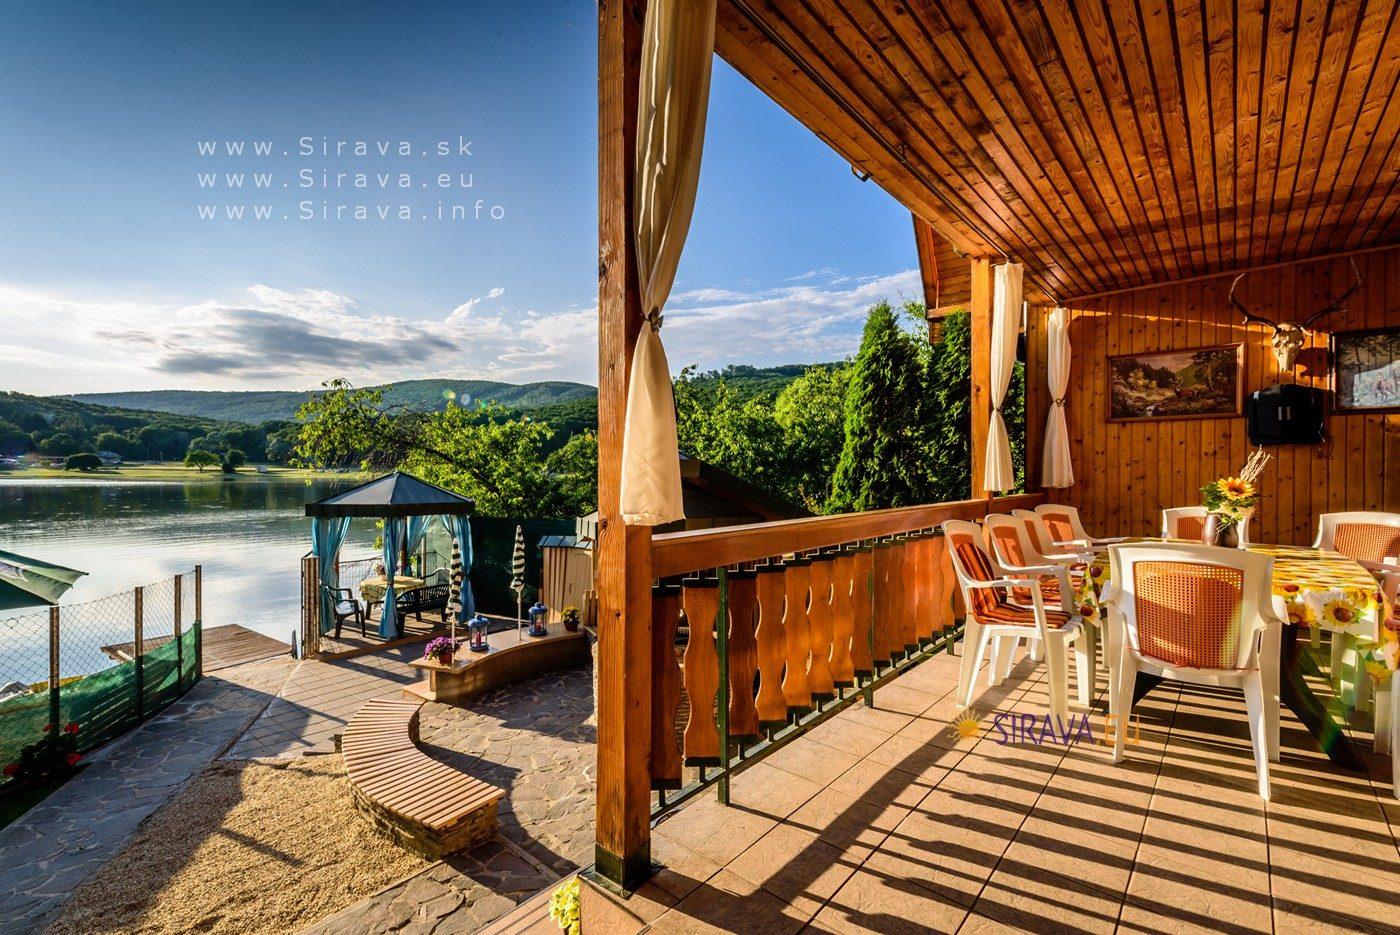 bab581af5 Luxusná chata pri jazere – Zemplínska šírava